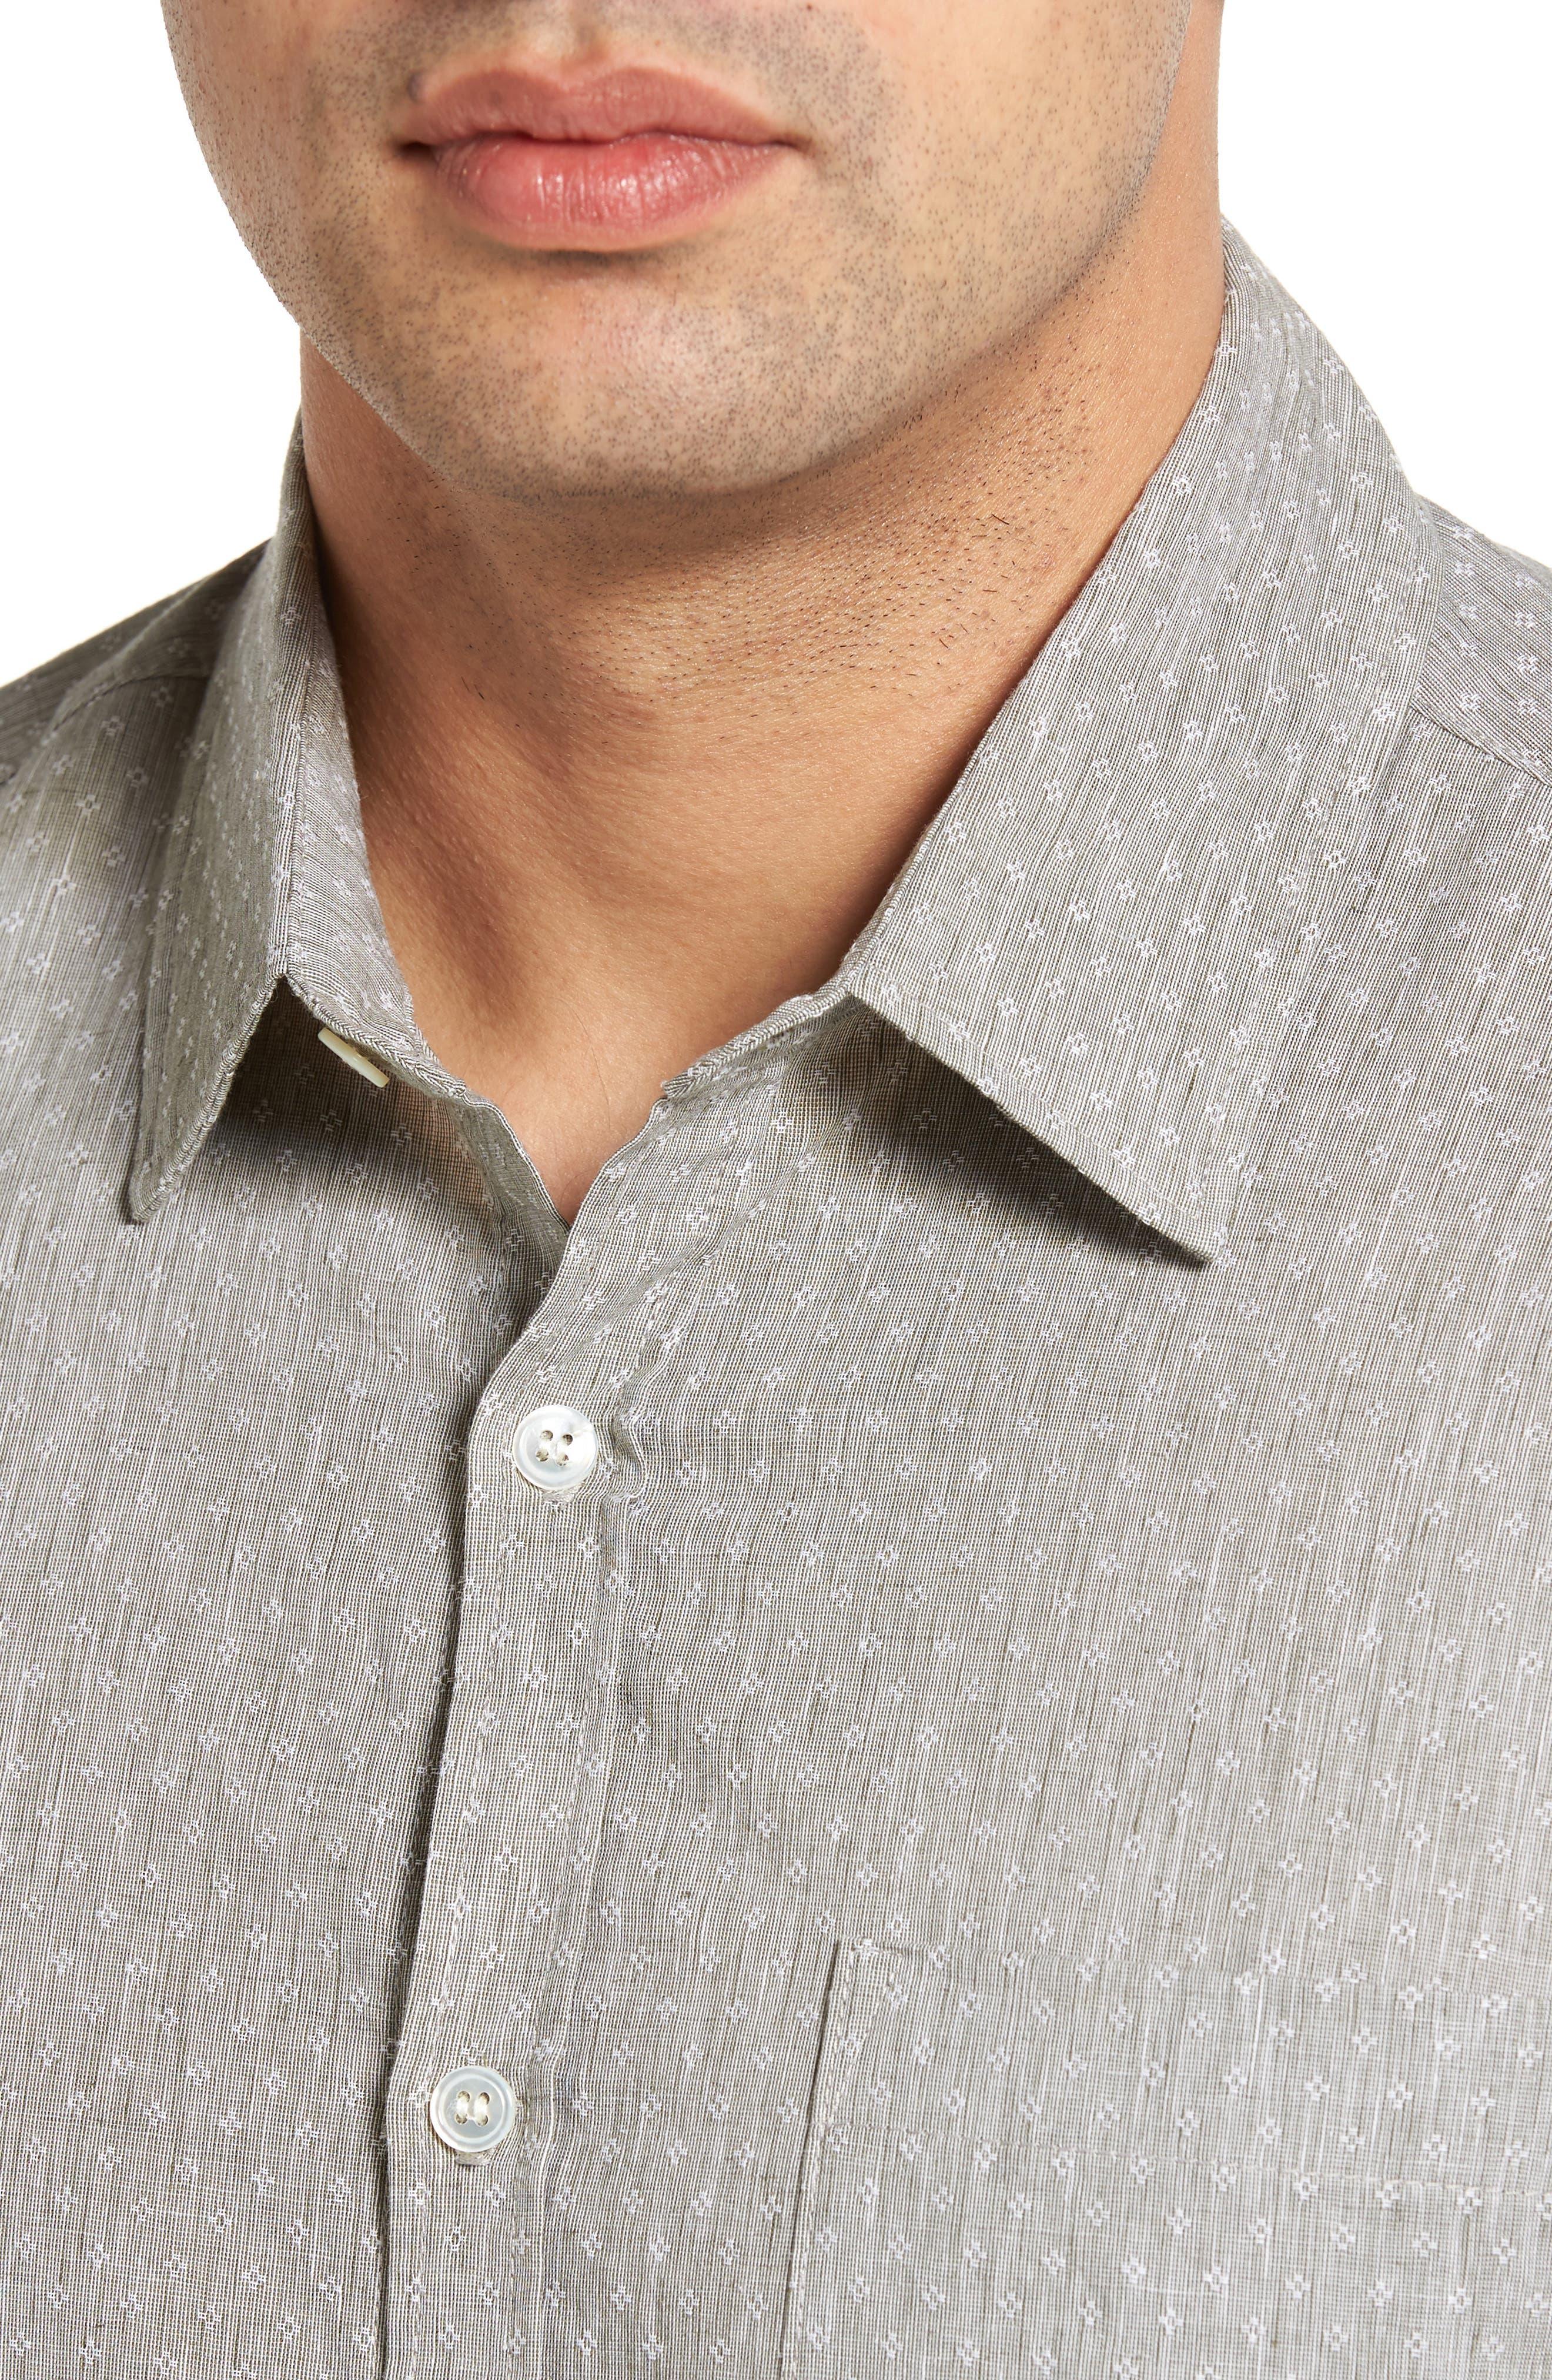 LANAI COLLECTION,                             Classic Fit Sport Shirt,                             Alternate thumbnail 4, color,                             310